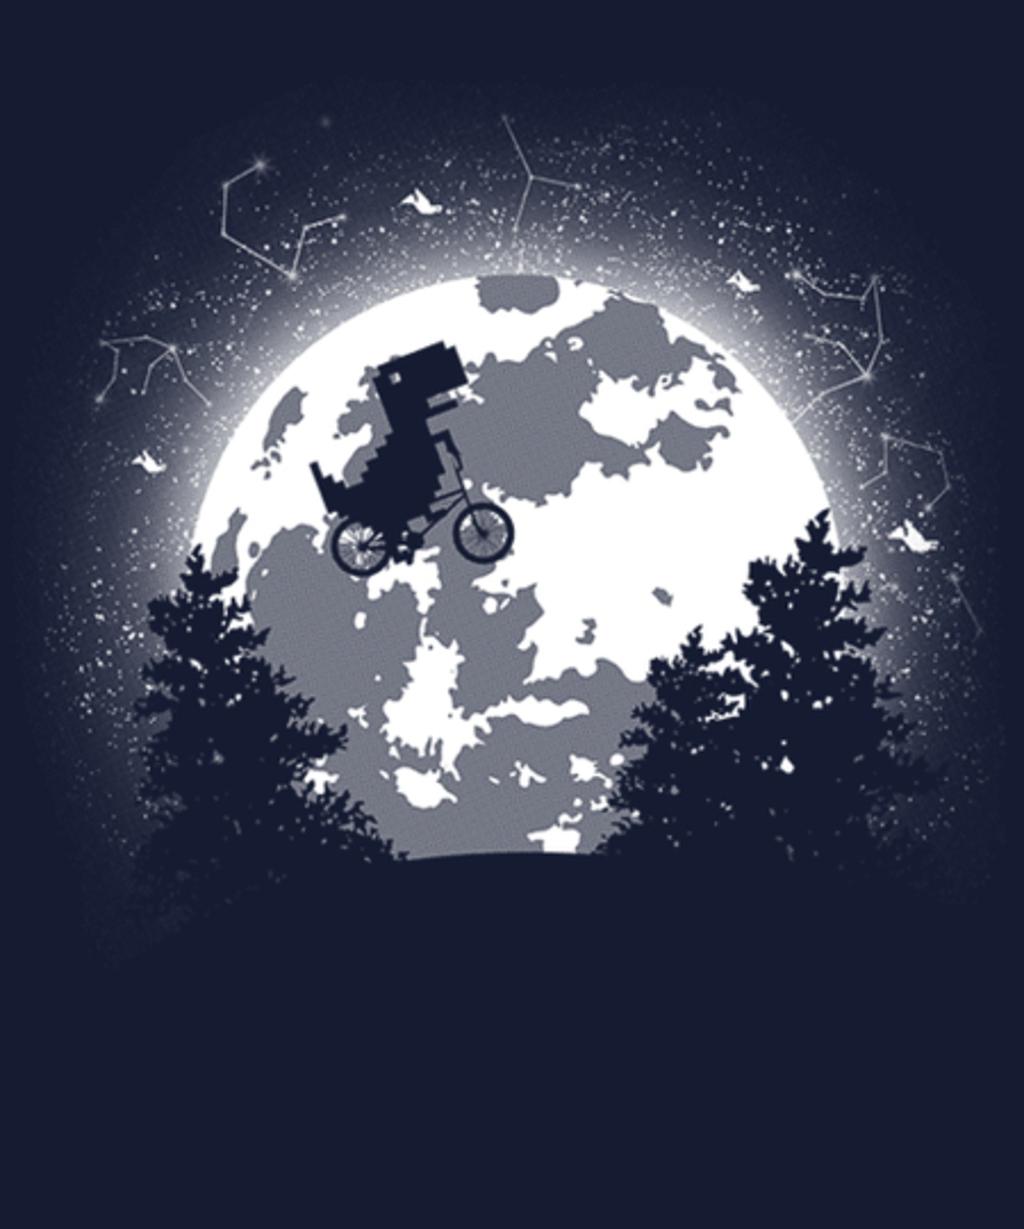 Qwertee: Night Walk